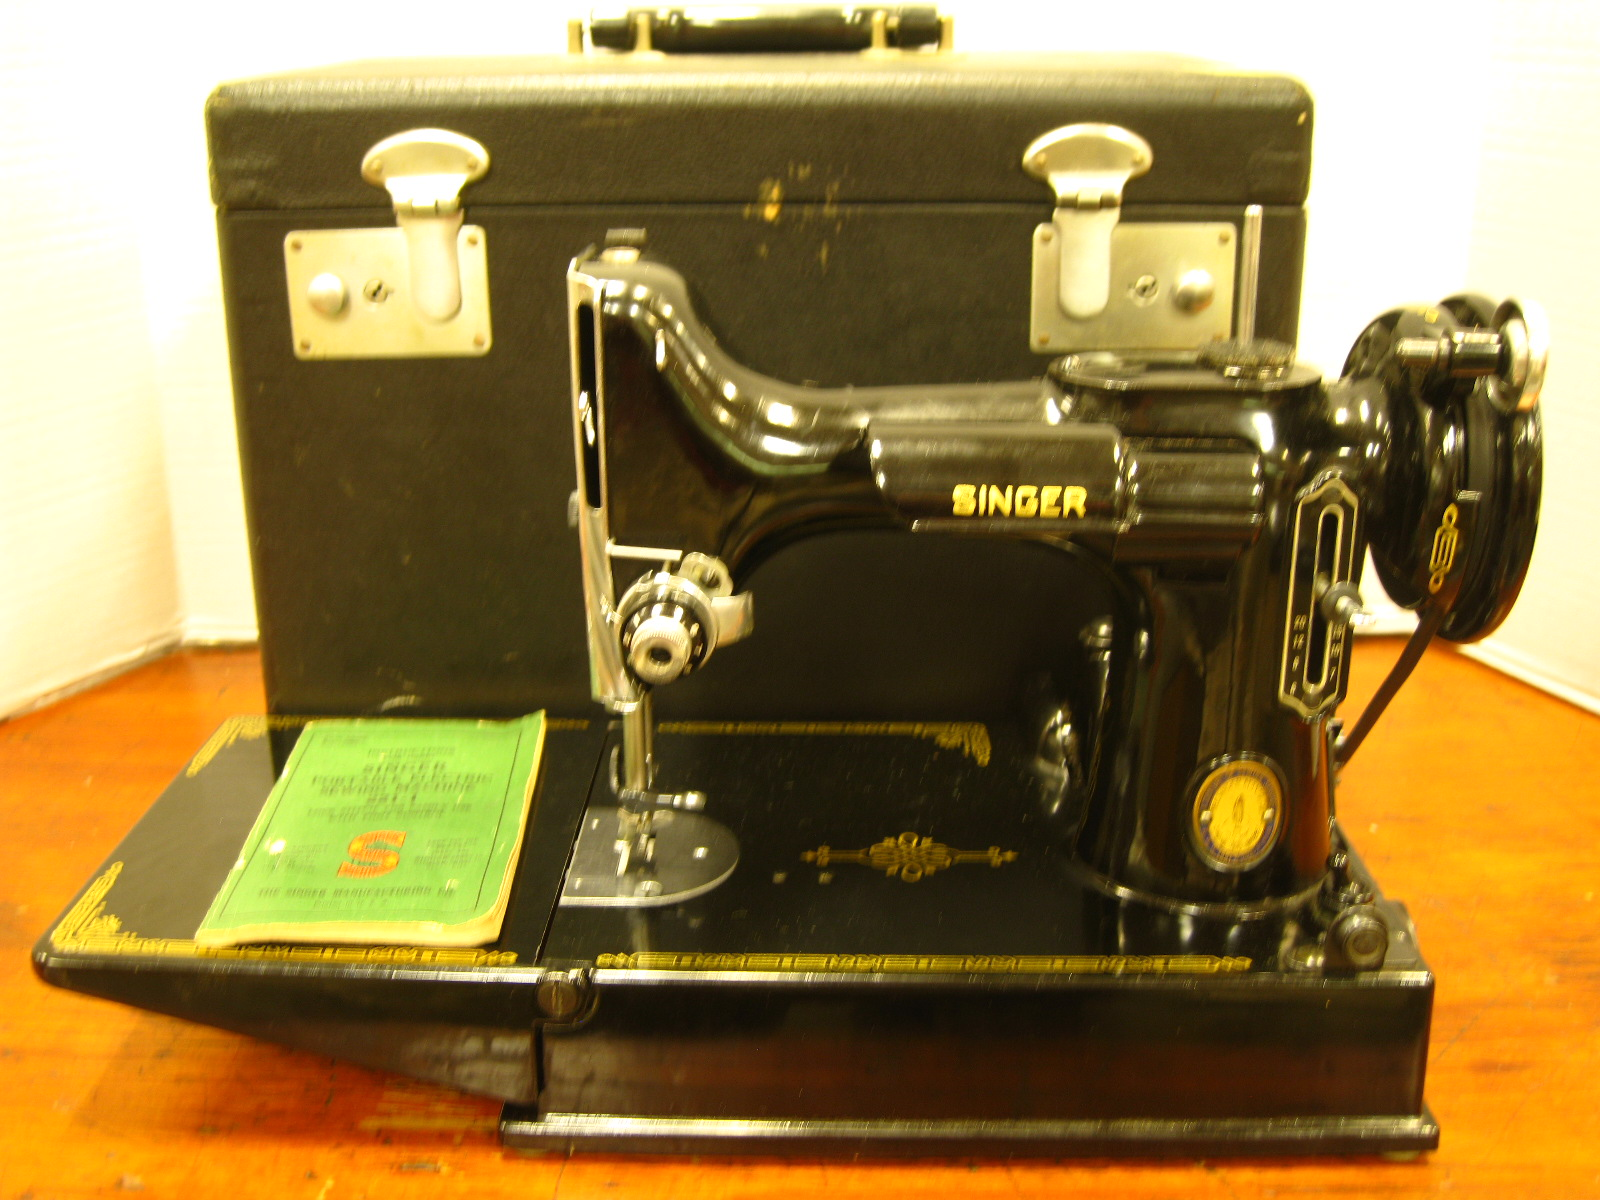 Antique Singer Sewing Machine Value